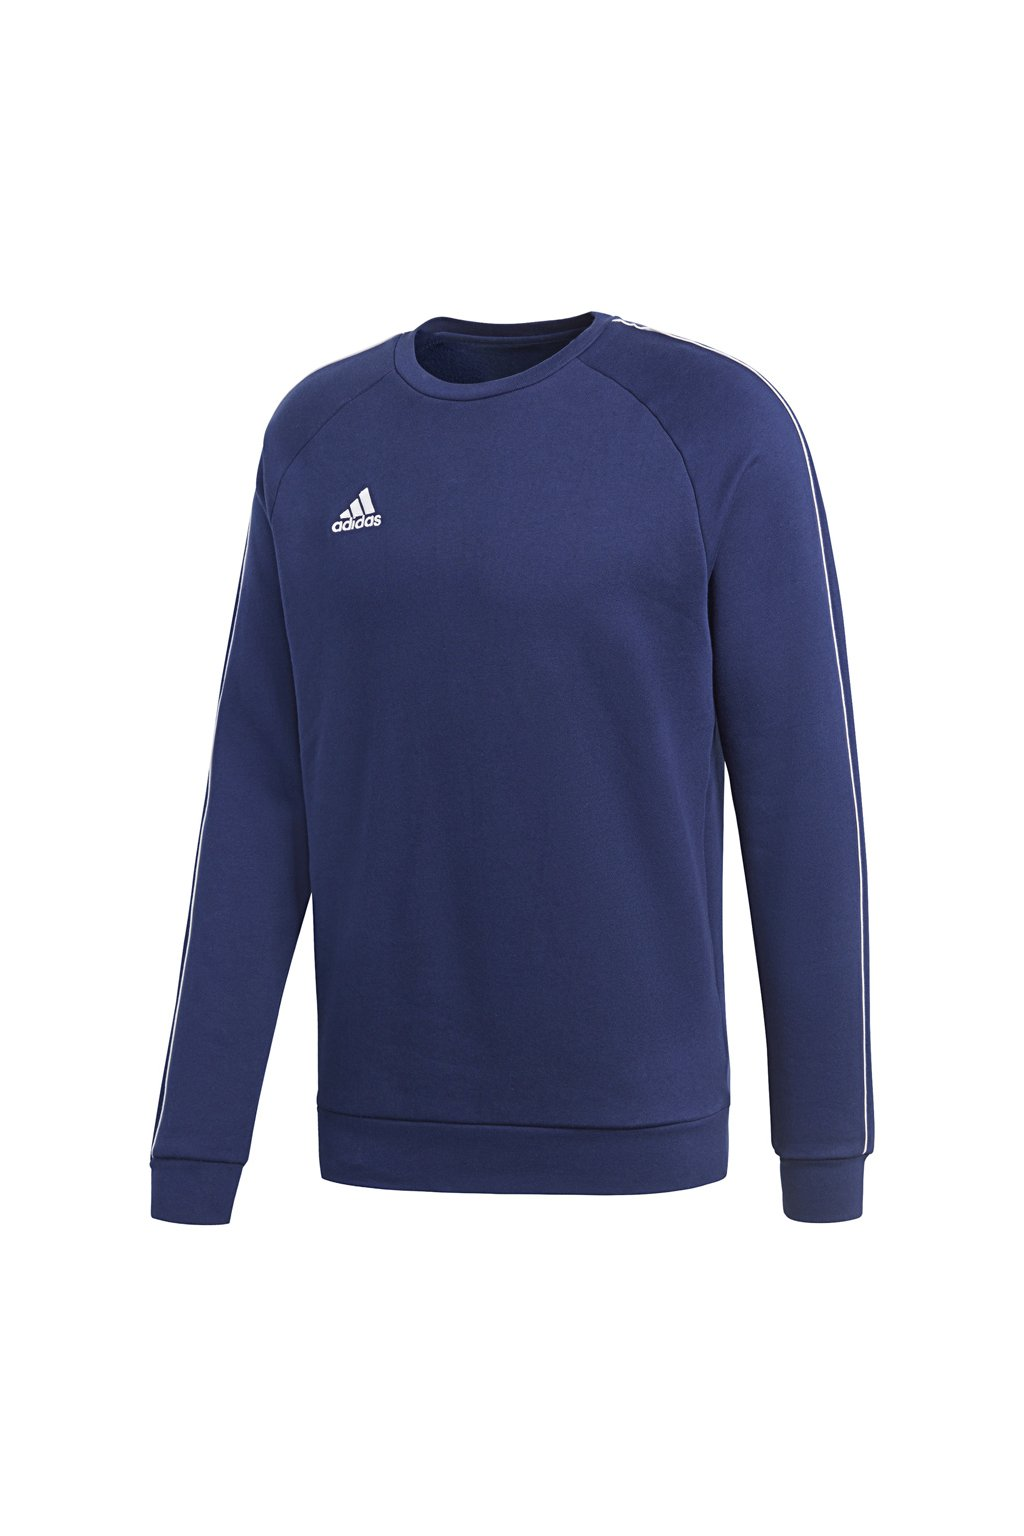 Pánska mikina Adidas Core 18 Sweat Top tmavo modrá CV3959